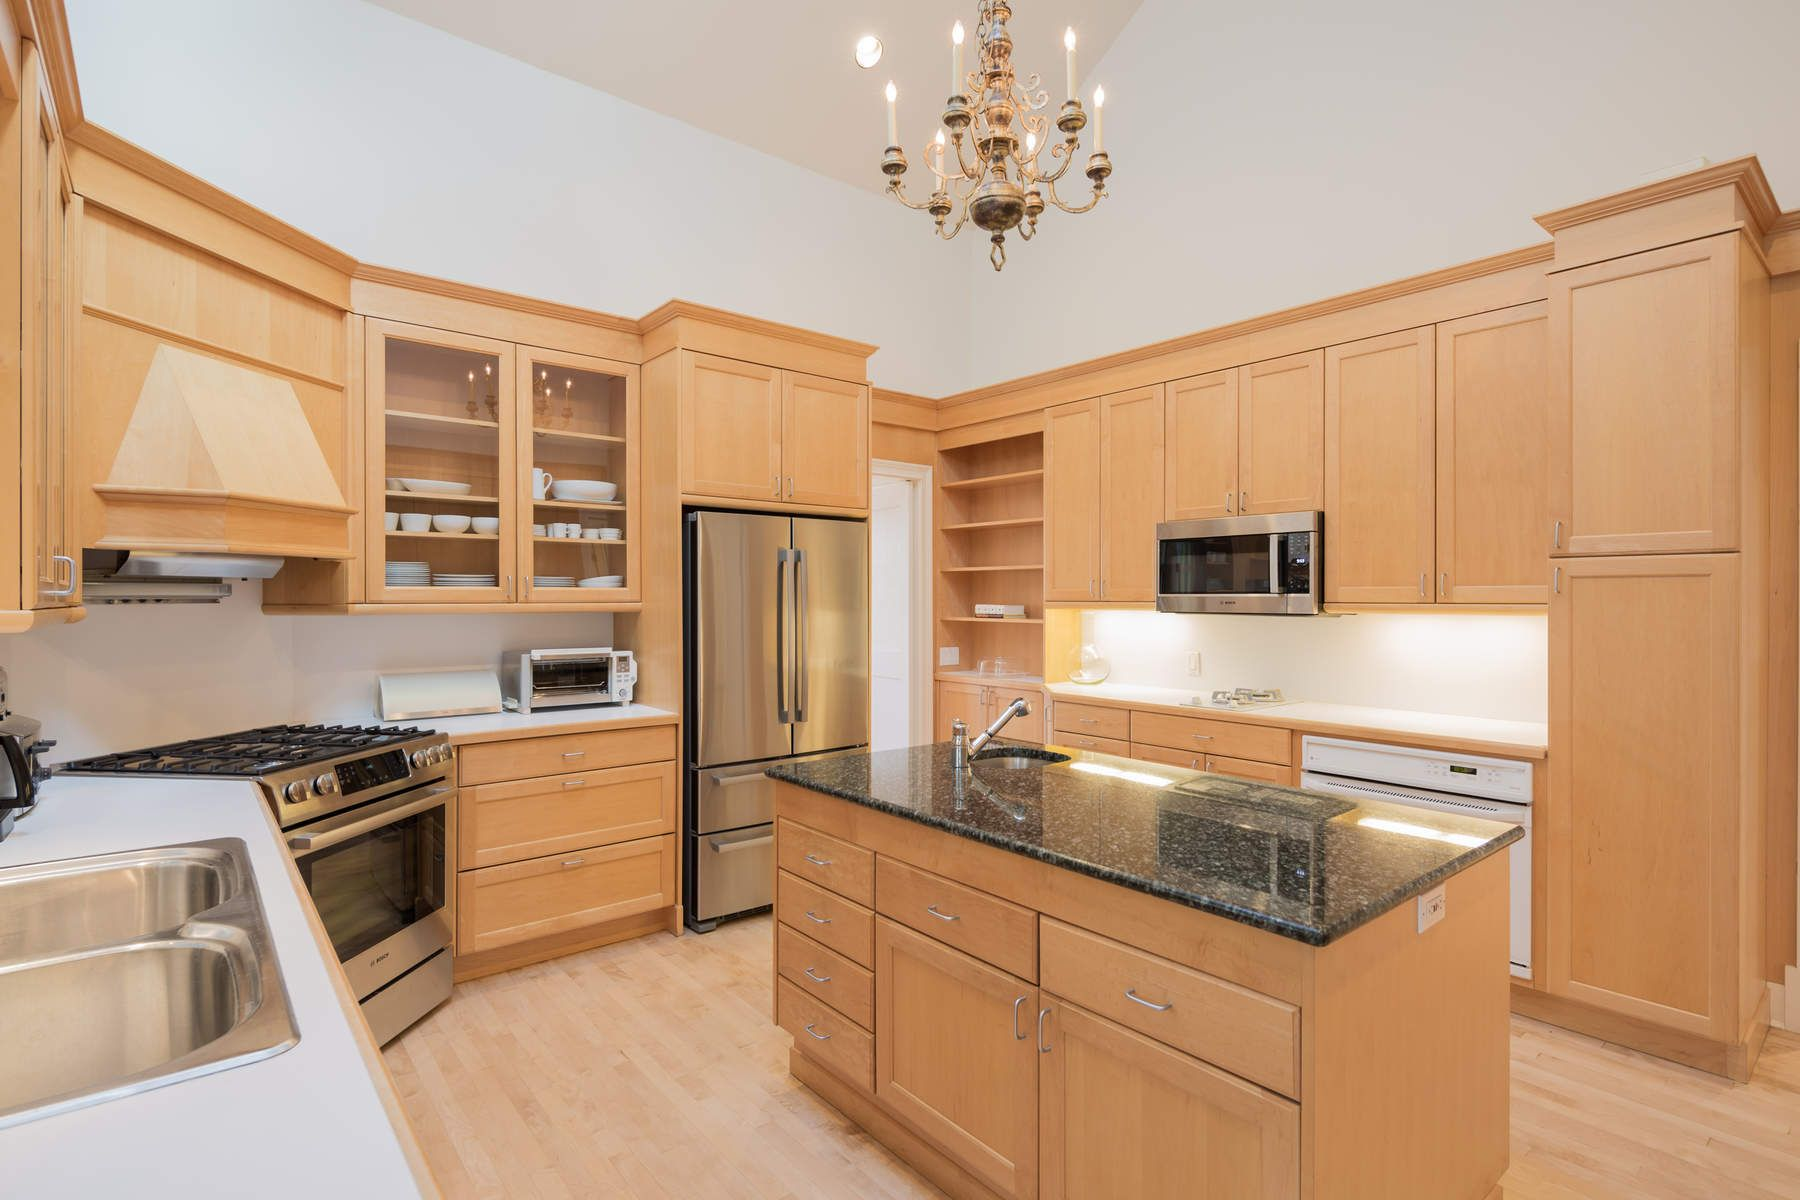 Additional photo for property listing at Stylish Village Fringe Contemporary 6 Clover Leaf Lane East Hampton, New York 11937 United States